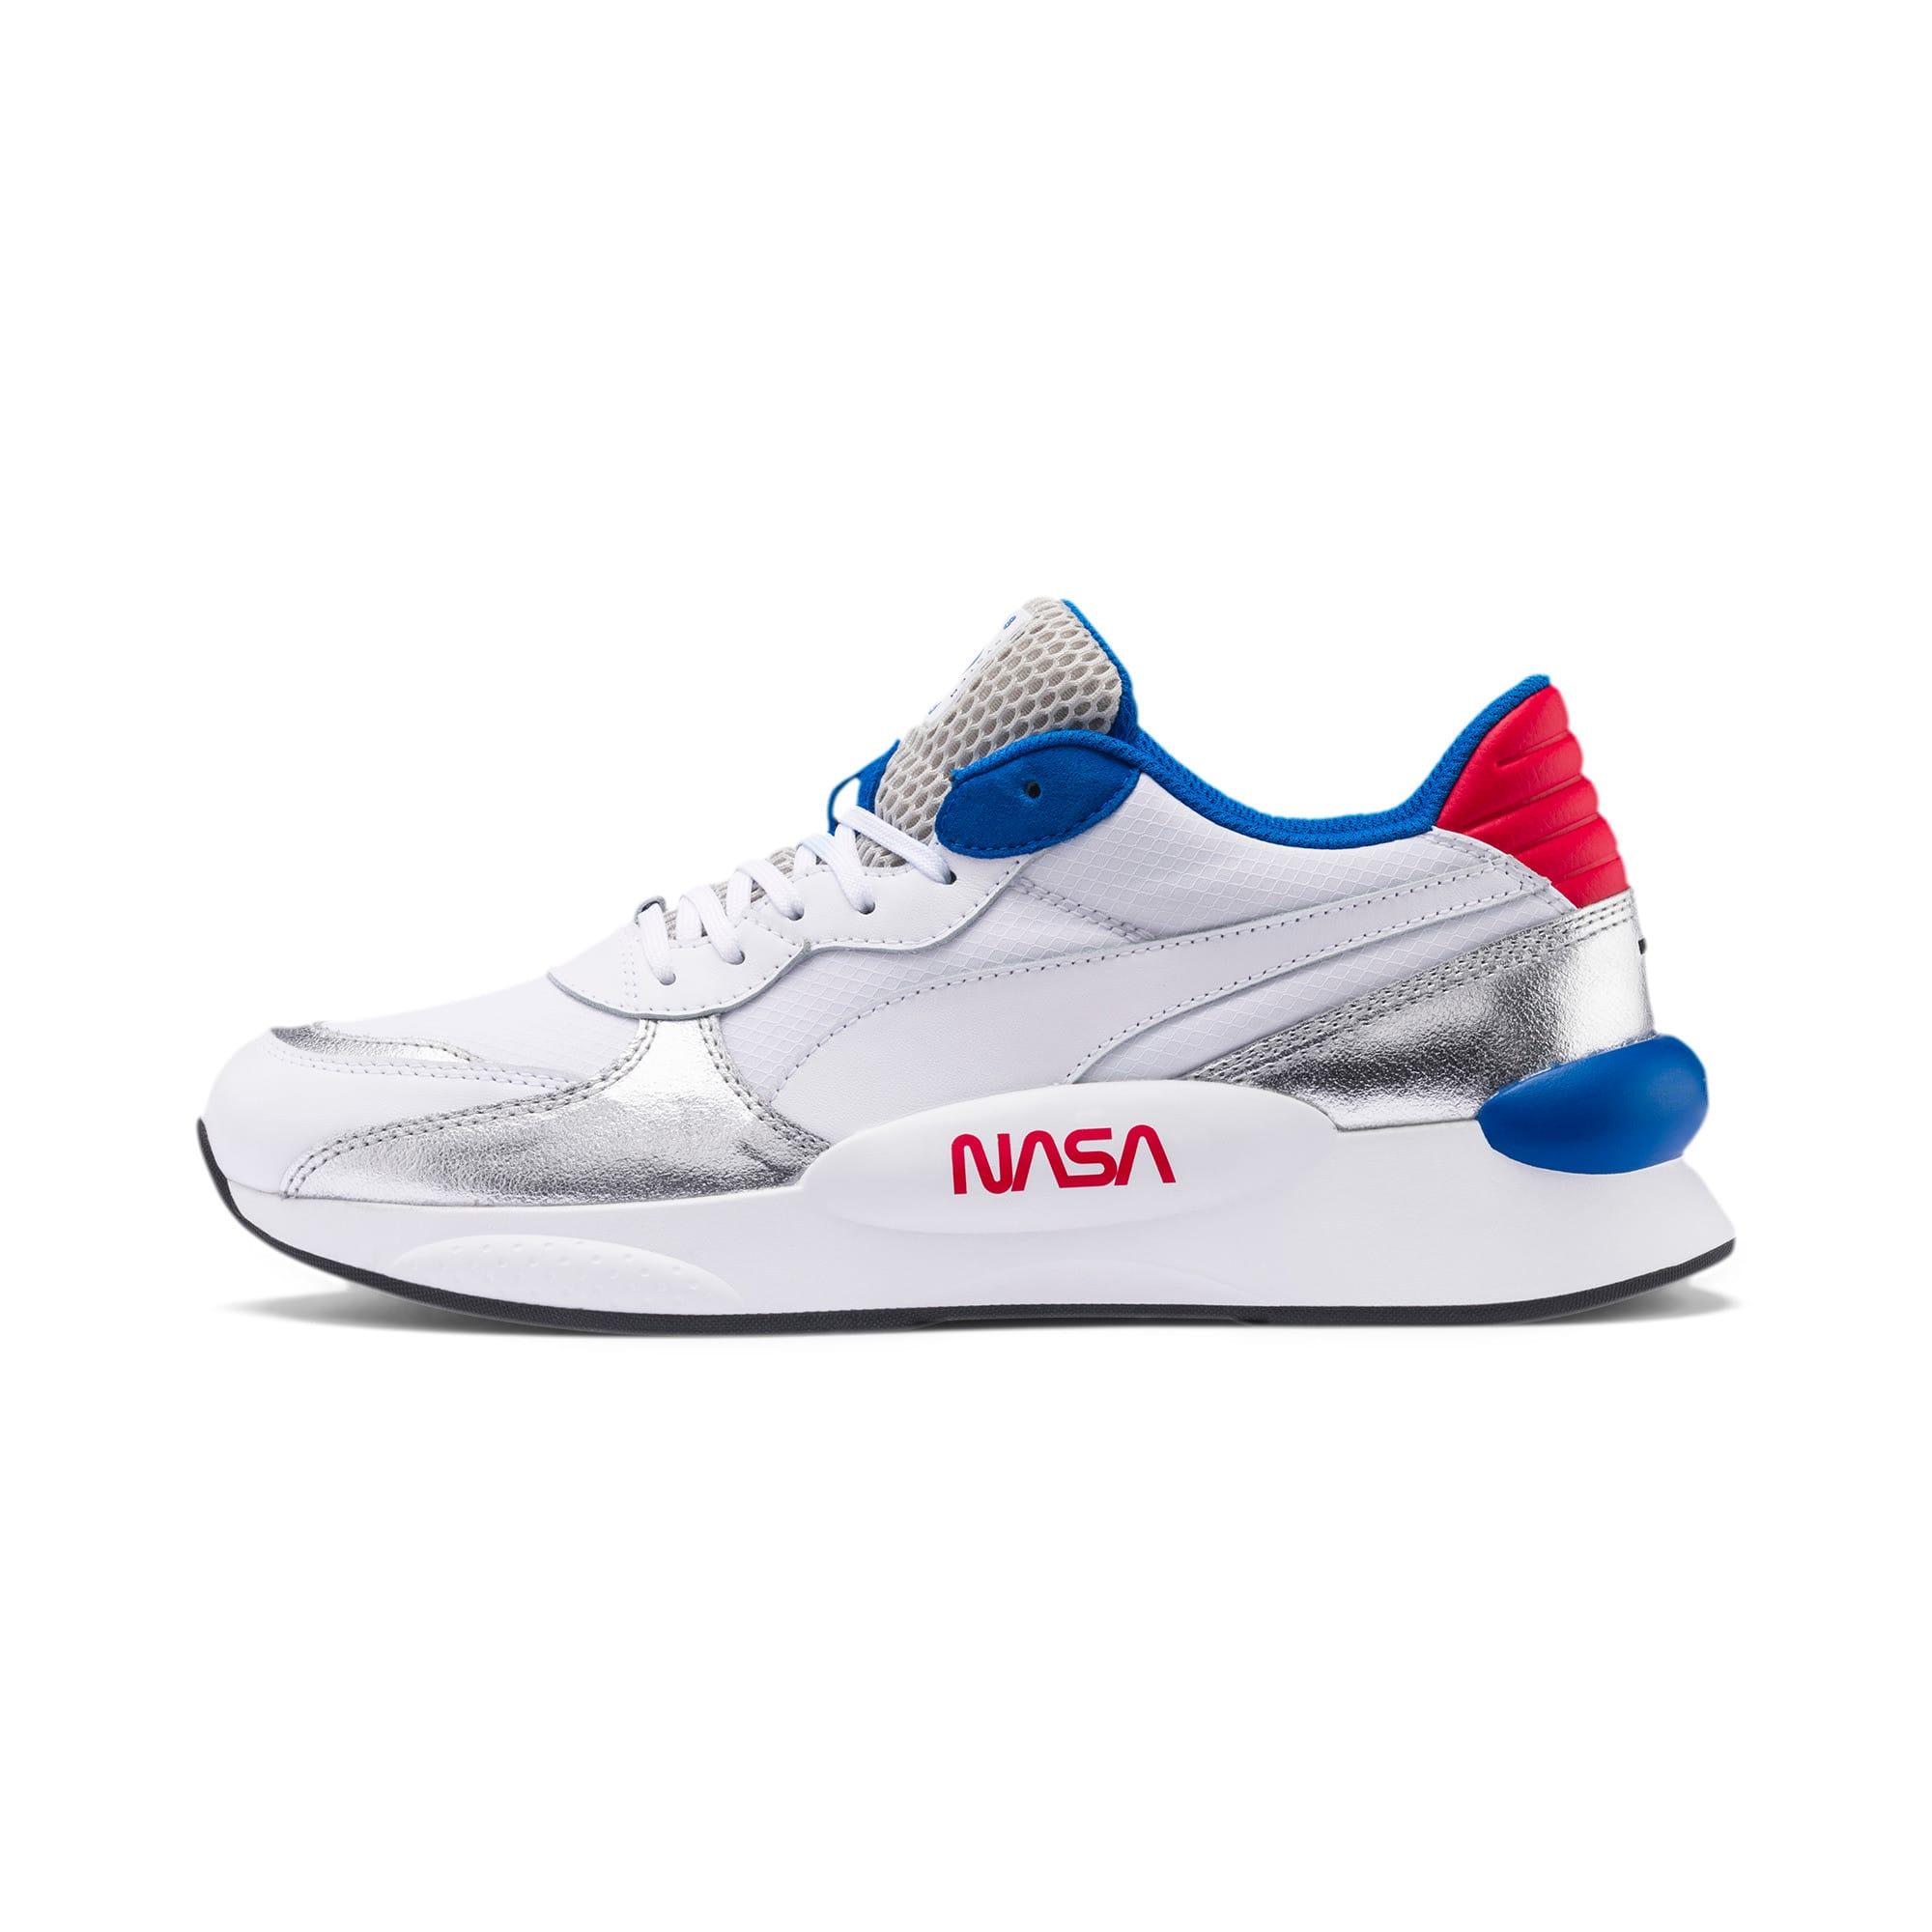 Thumbnail 1 of RS 9.8 Space Agency Sneakers, Puma White-Puma Silver, medium